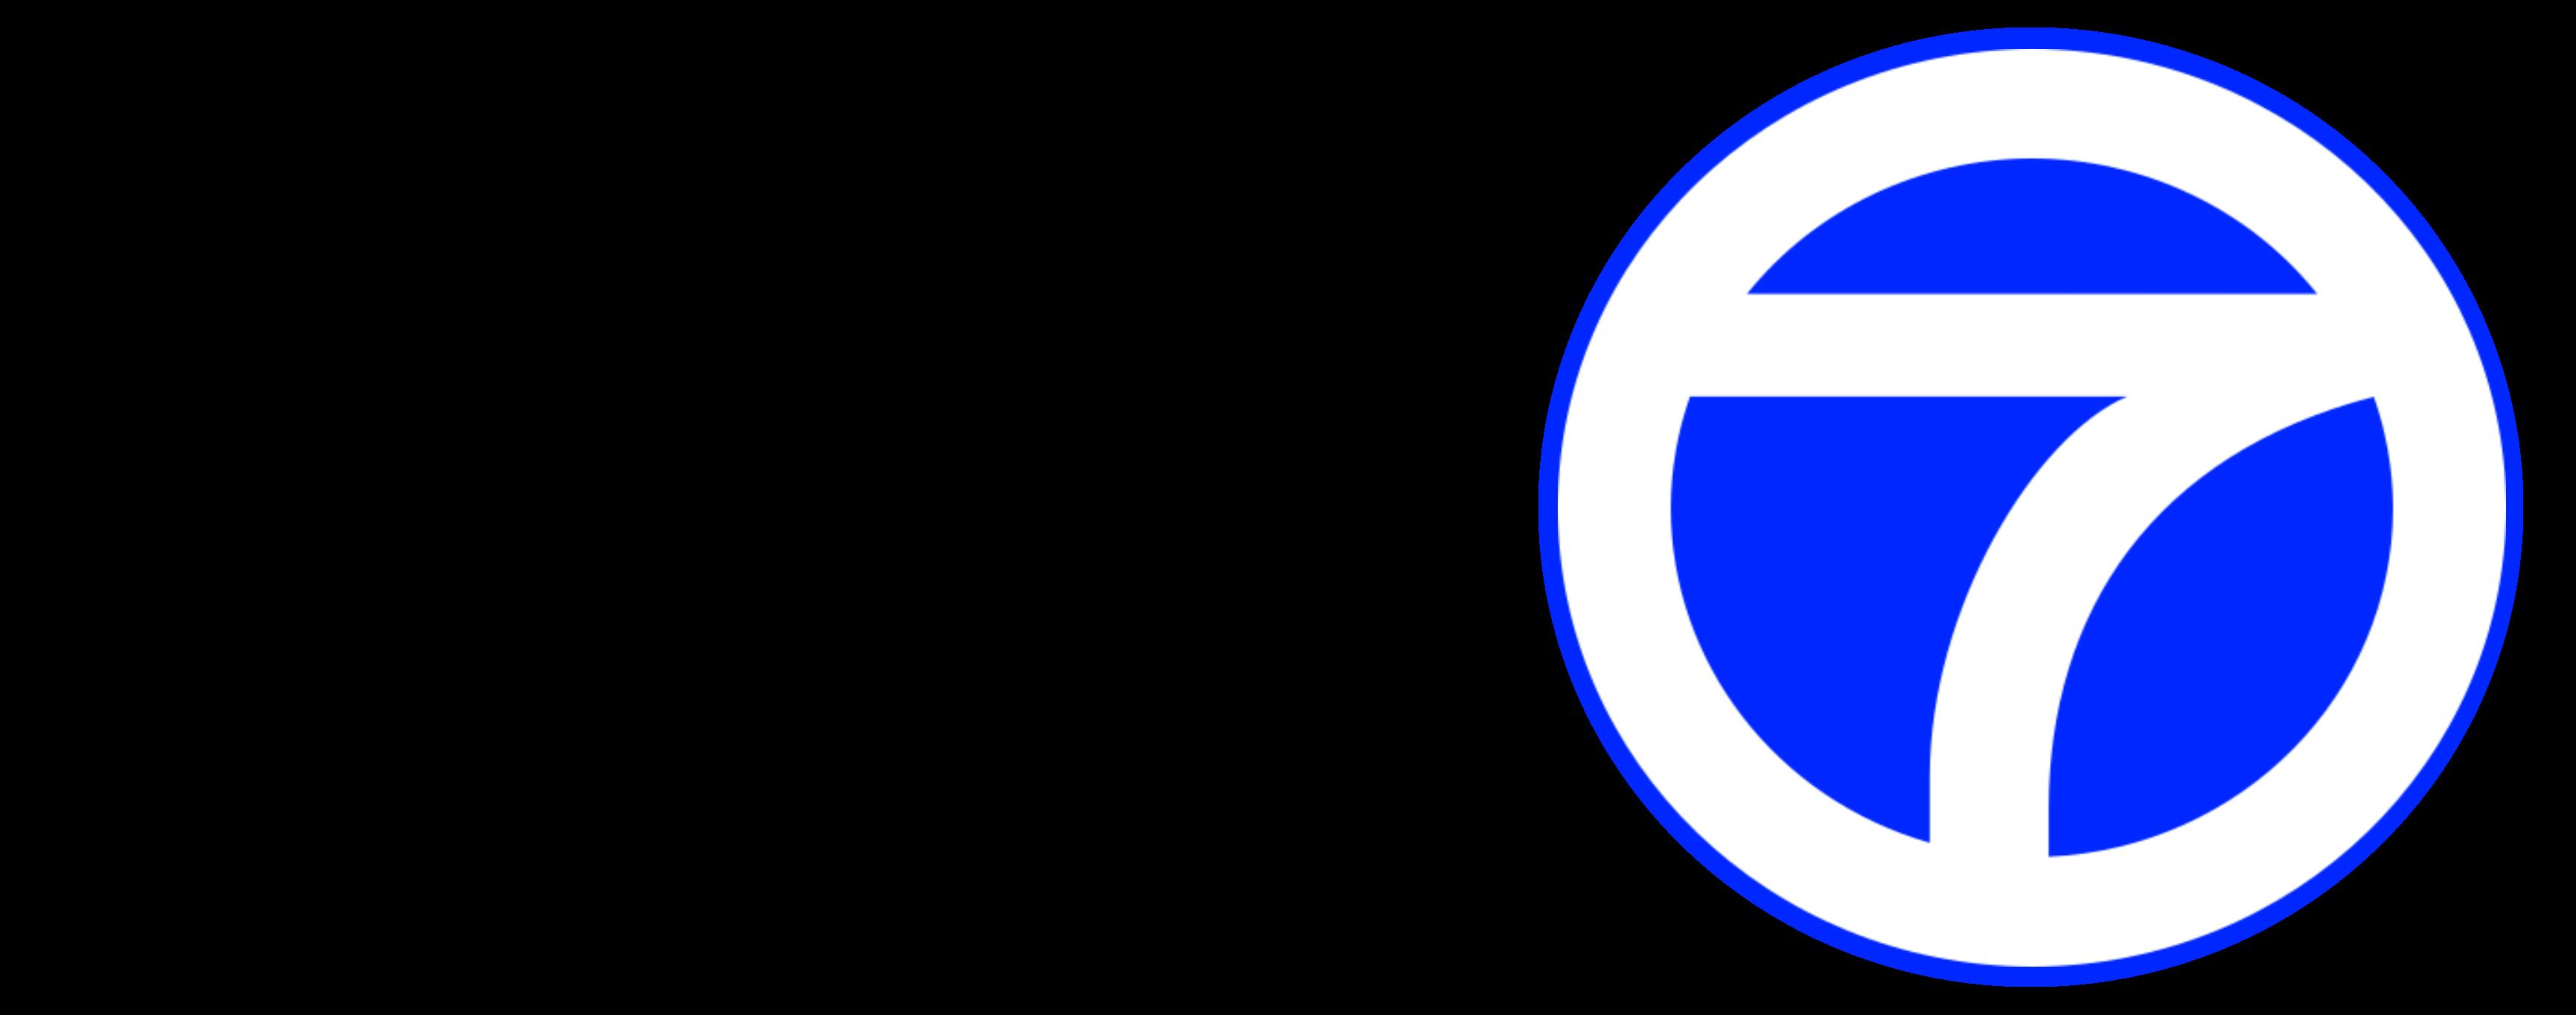 AlternateHistory.com's WLS logo #1.png